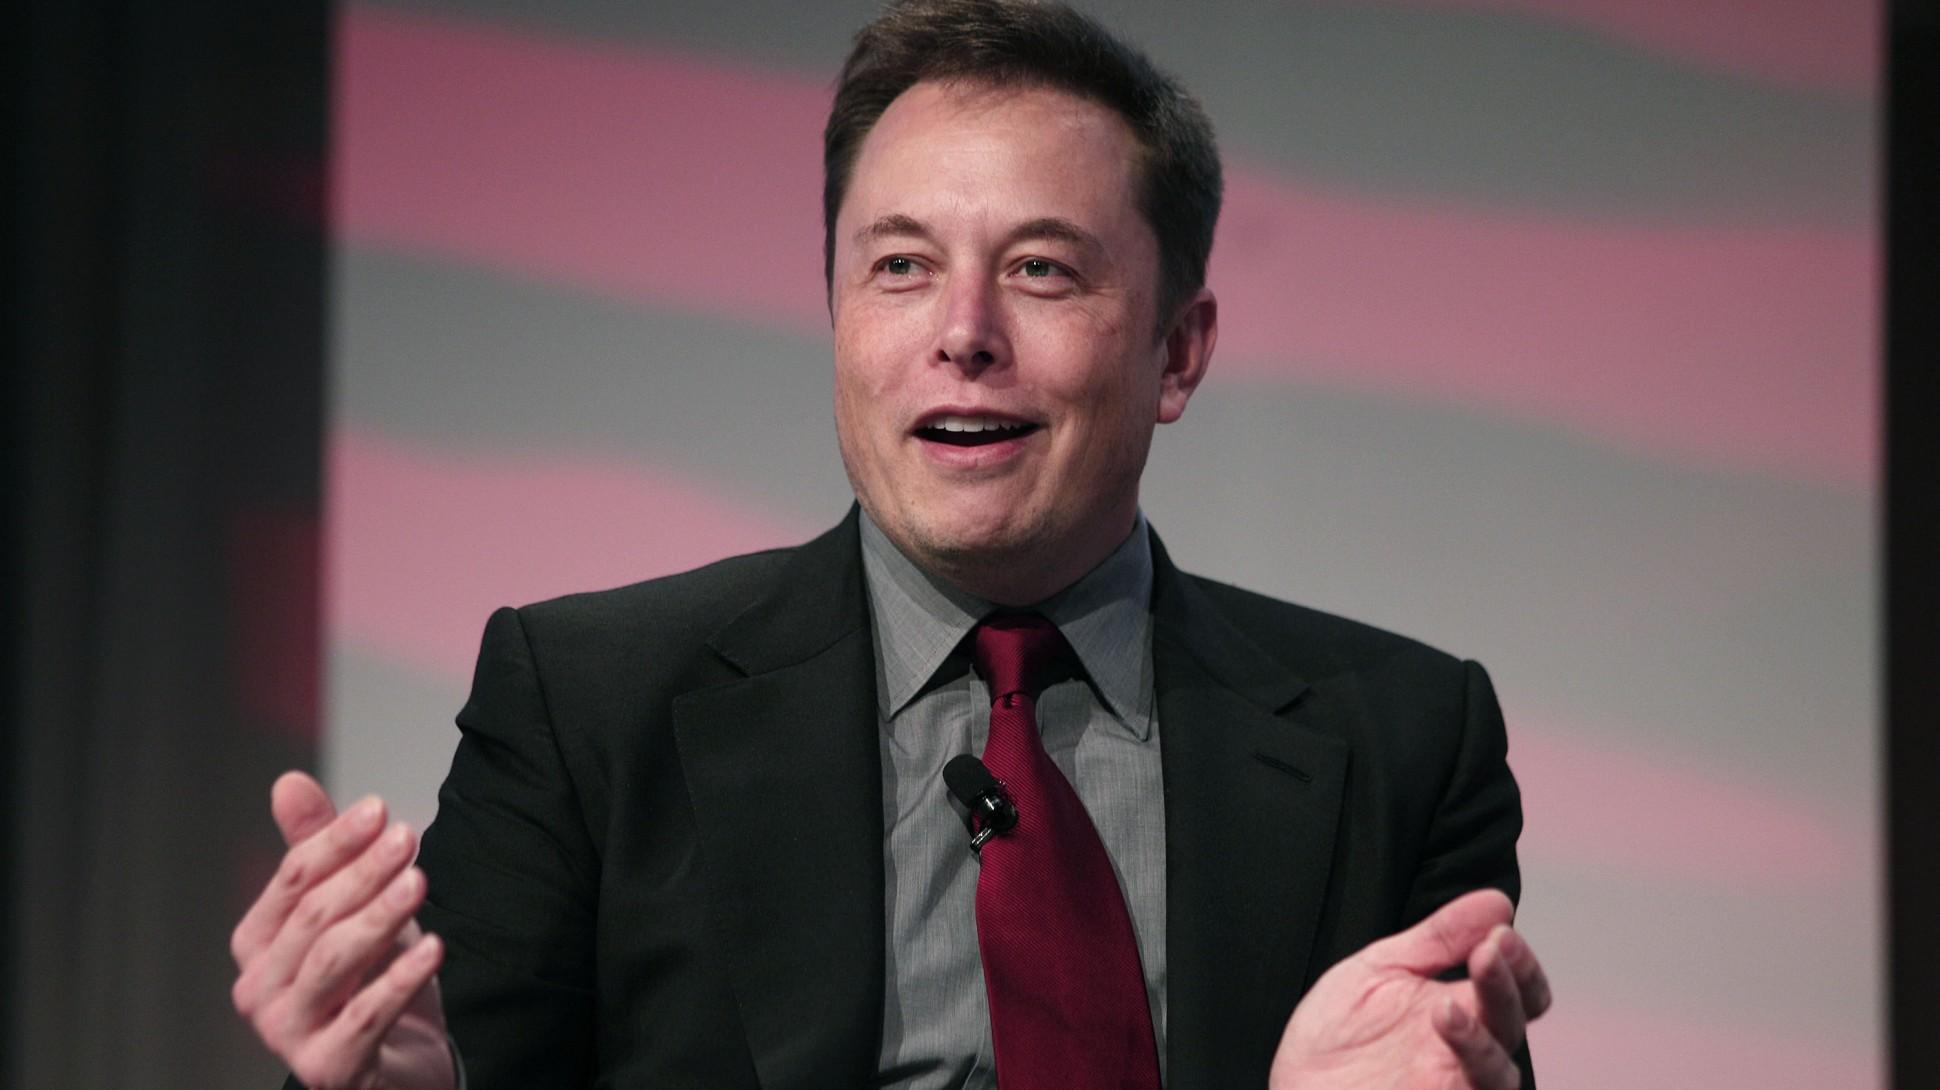 Elon Musk Admits to